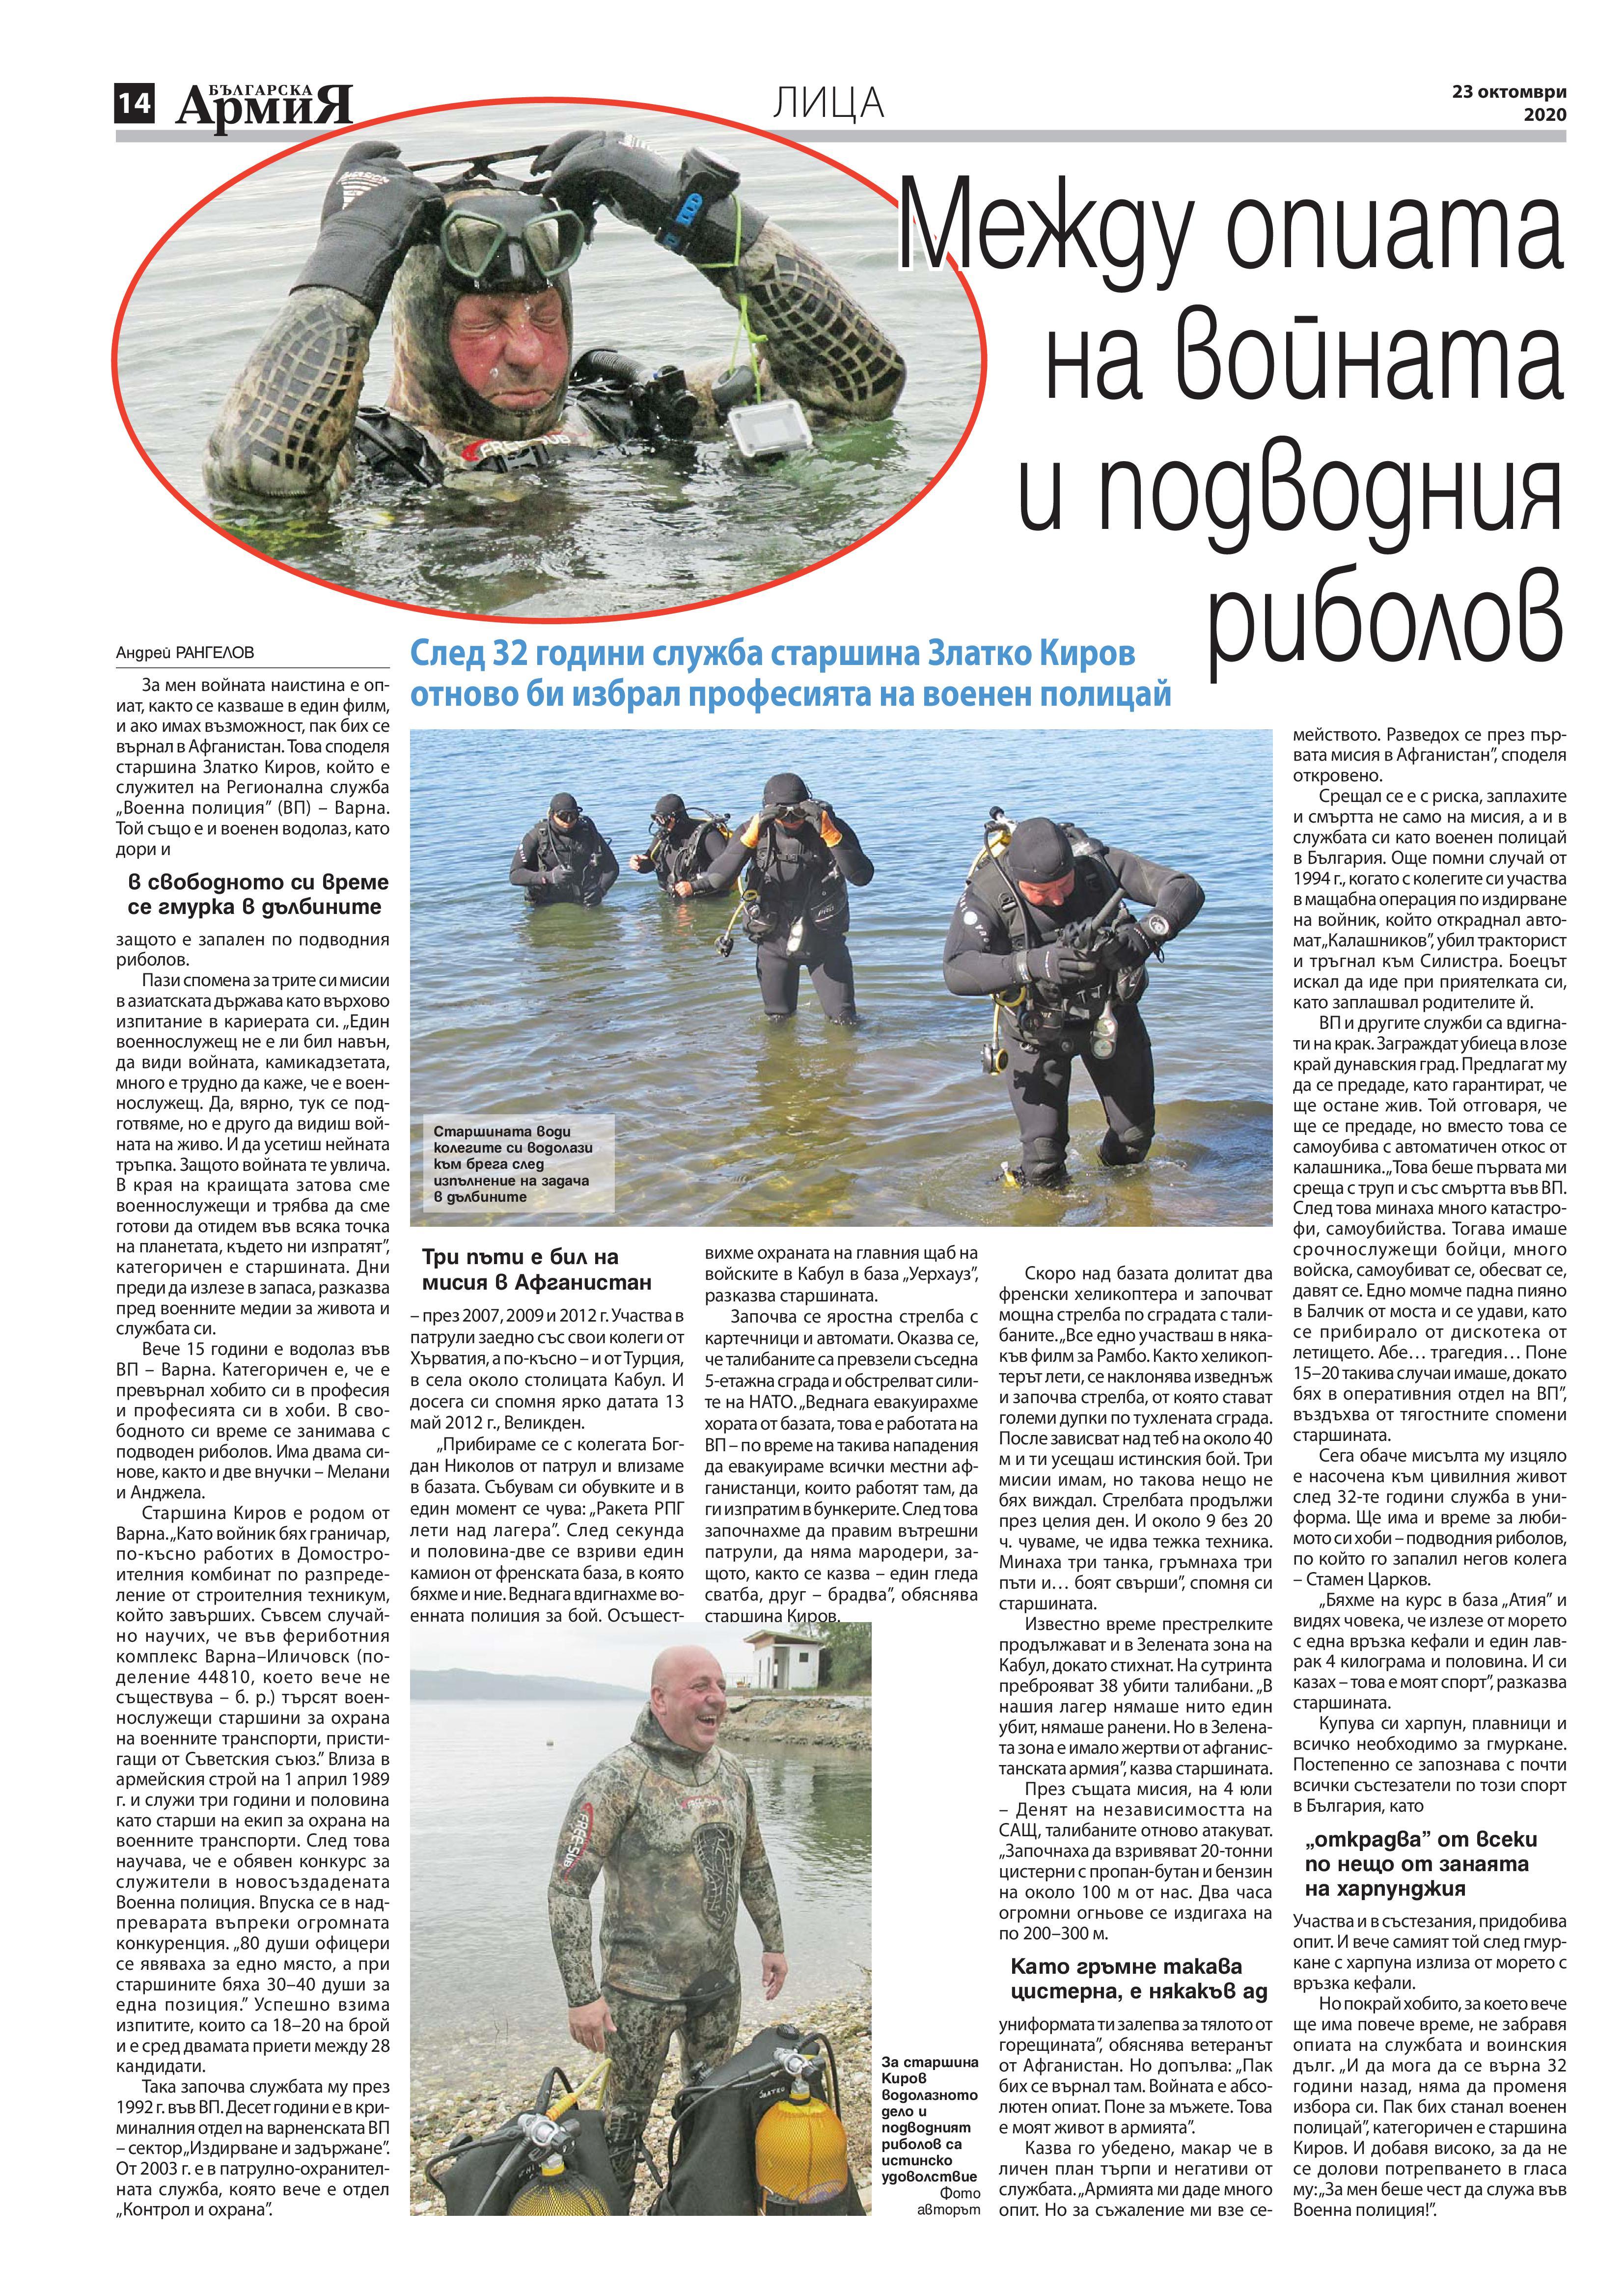 https://armymedia.bg/wp-content/uploads/2015/06/14-45.jpg